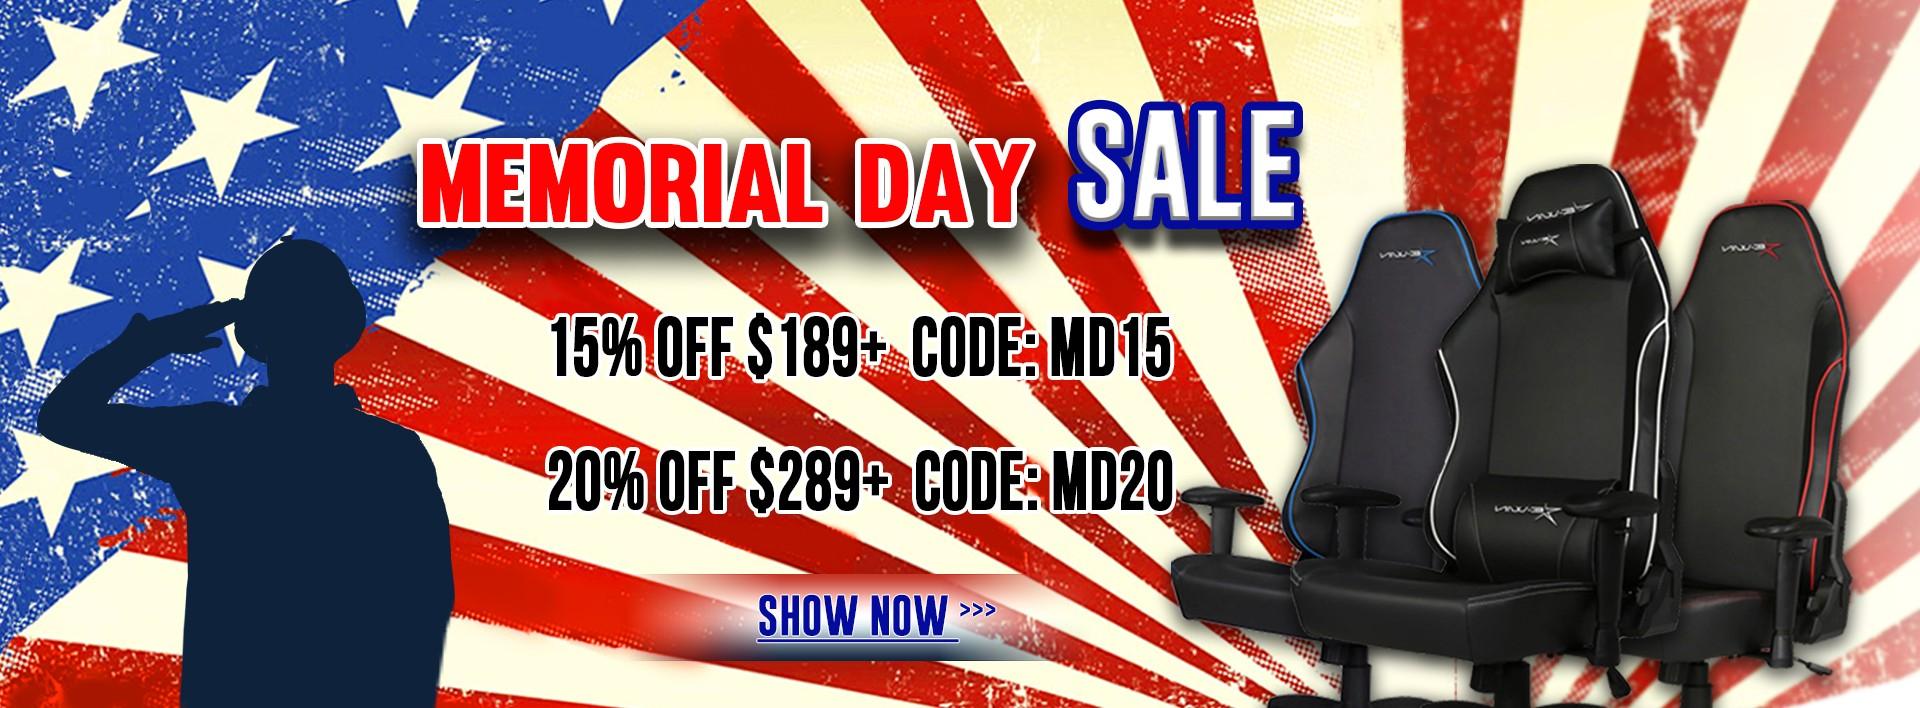 2020 Memorial Day Sale